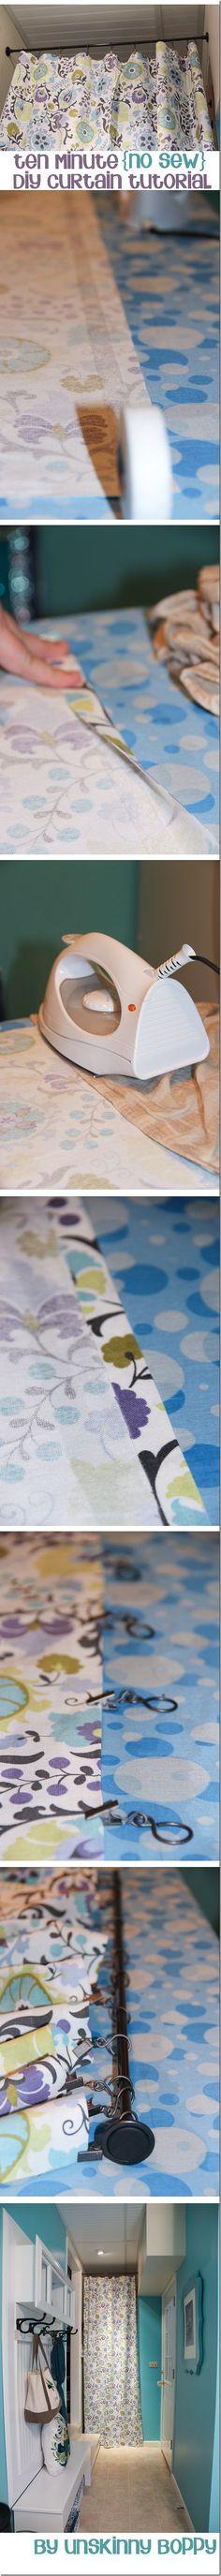 A 10 minute no sew diy curtain tutorial